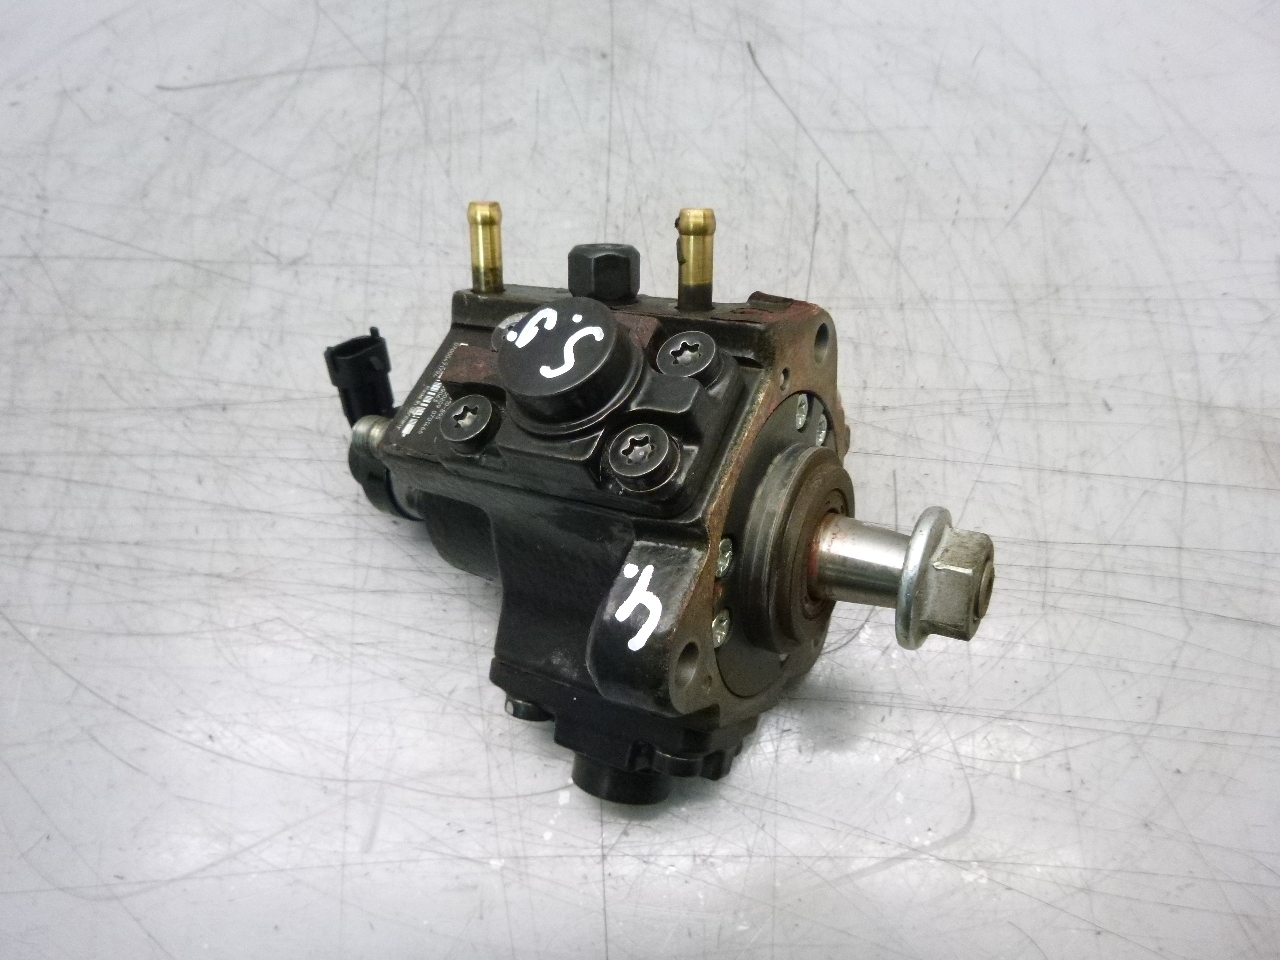 Hochdruckpumpe Cadillac Opel Saab Zafira 9-3 9-5 1,9 CDTI Z19DTH DE313451